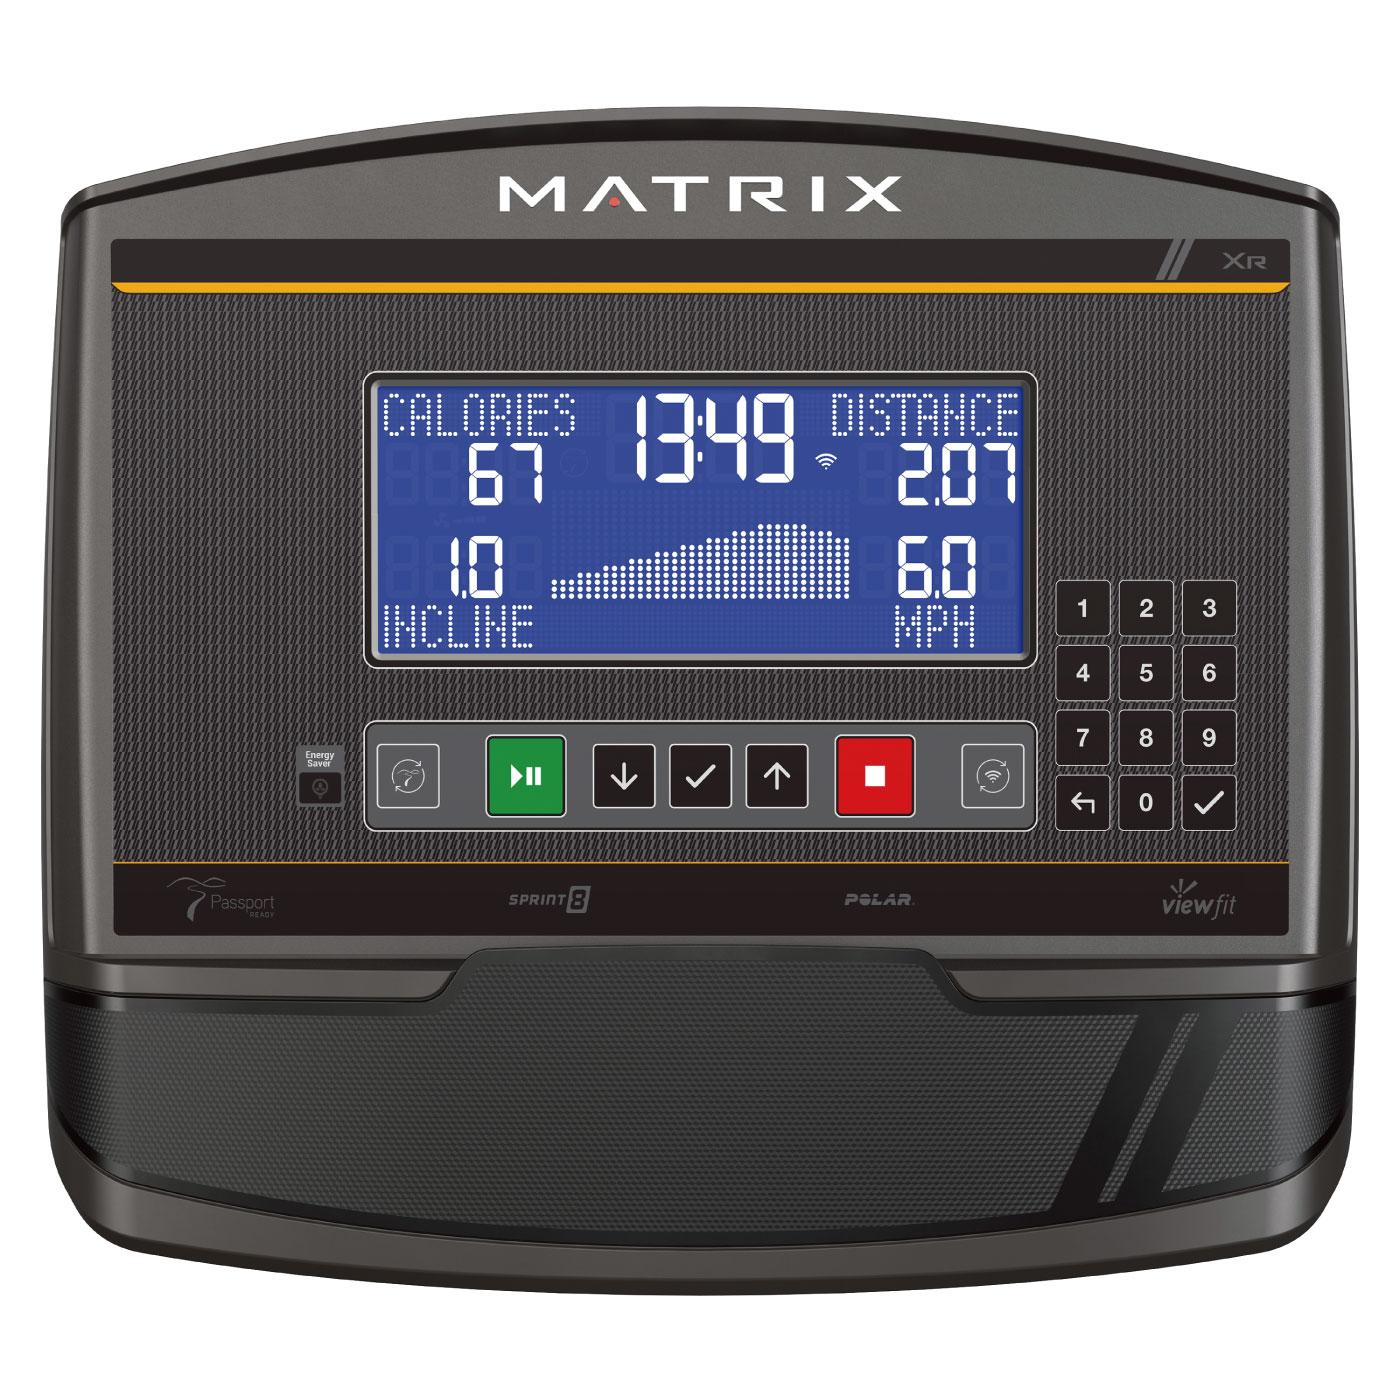 T70-XR/家庭用ルームランナー〈家庭用MATRIX〉《ジョンソンヘルステック》